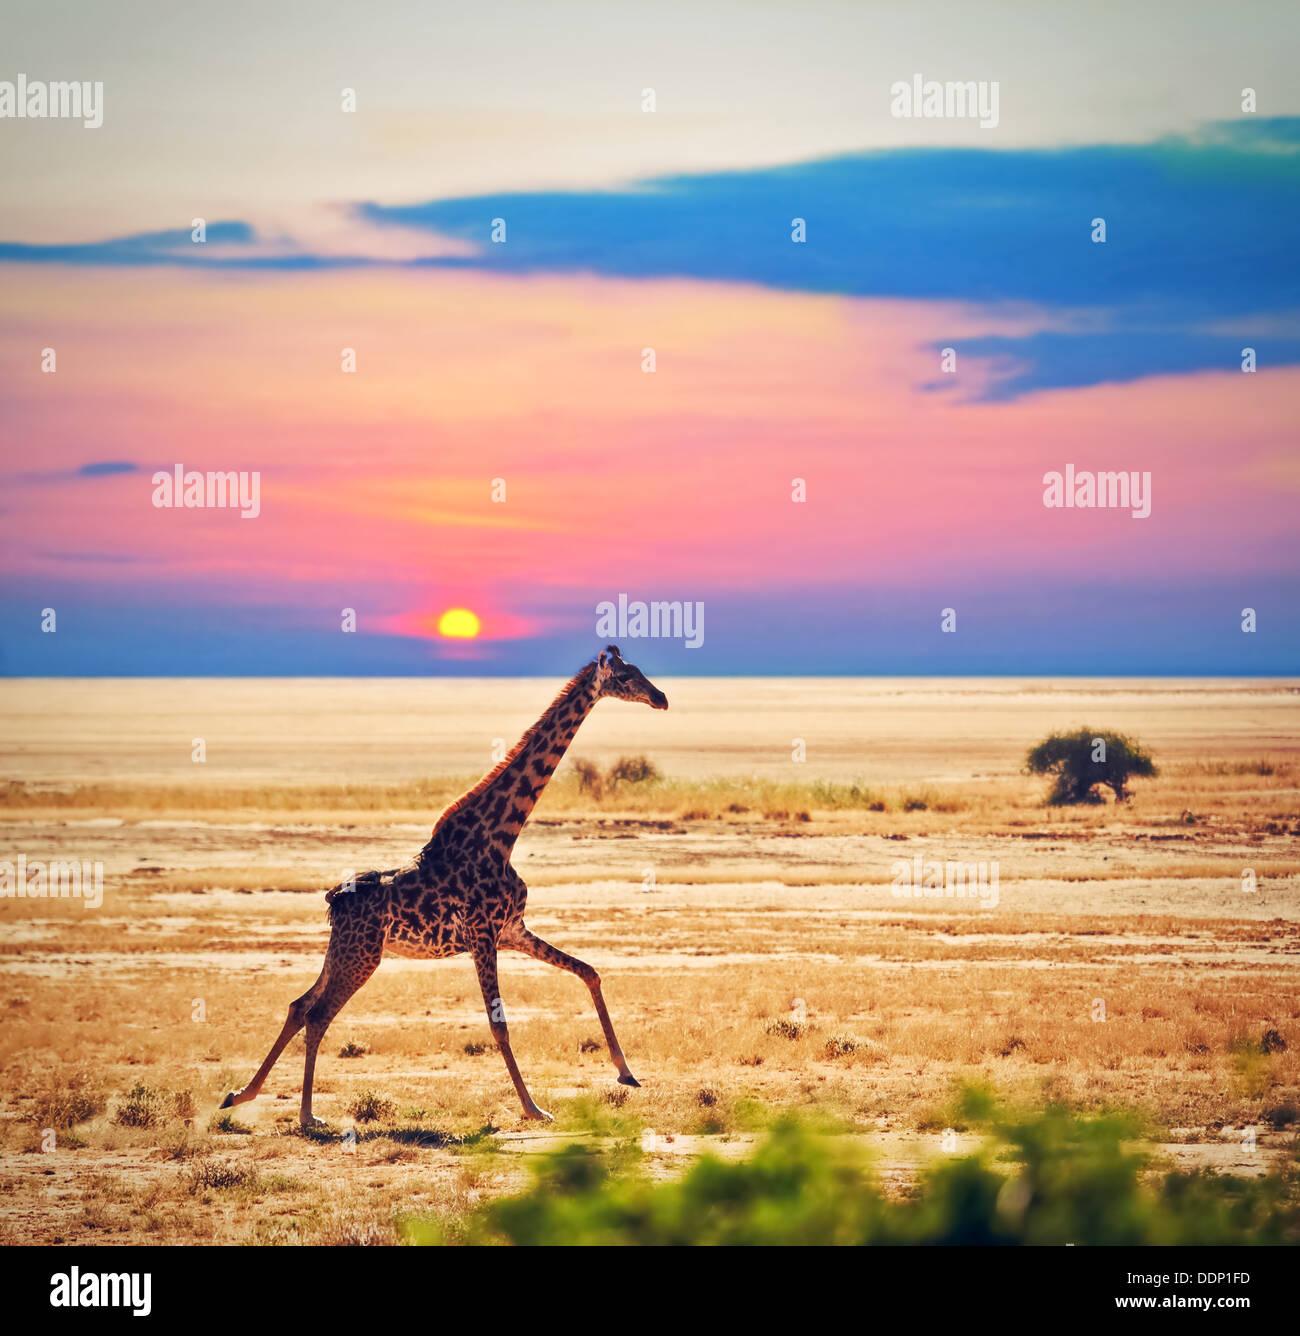 Fauna - Jirafa corriendo en la sabana al atardecer. Safari en el Parque Nacional Amboseli, Kenia, África Imagen De Stock